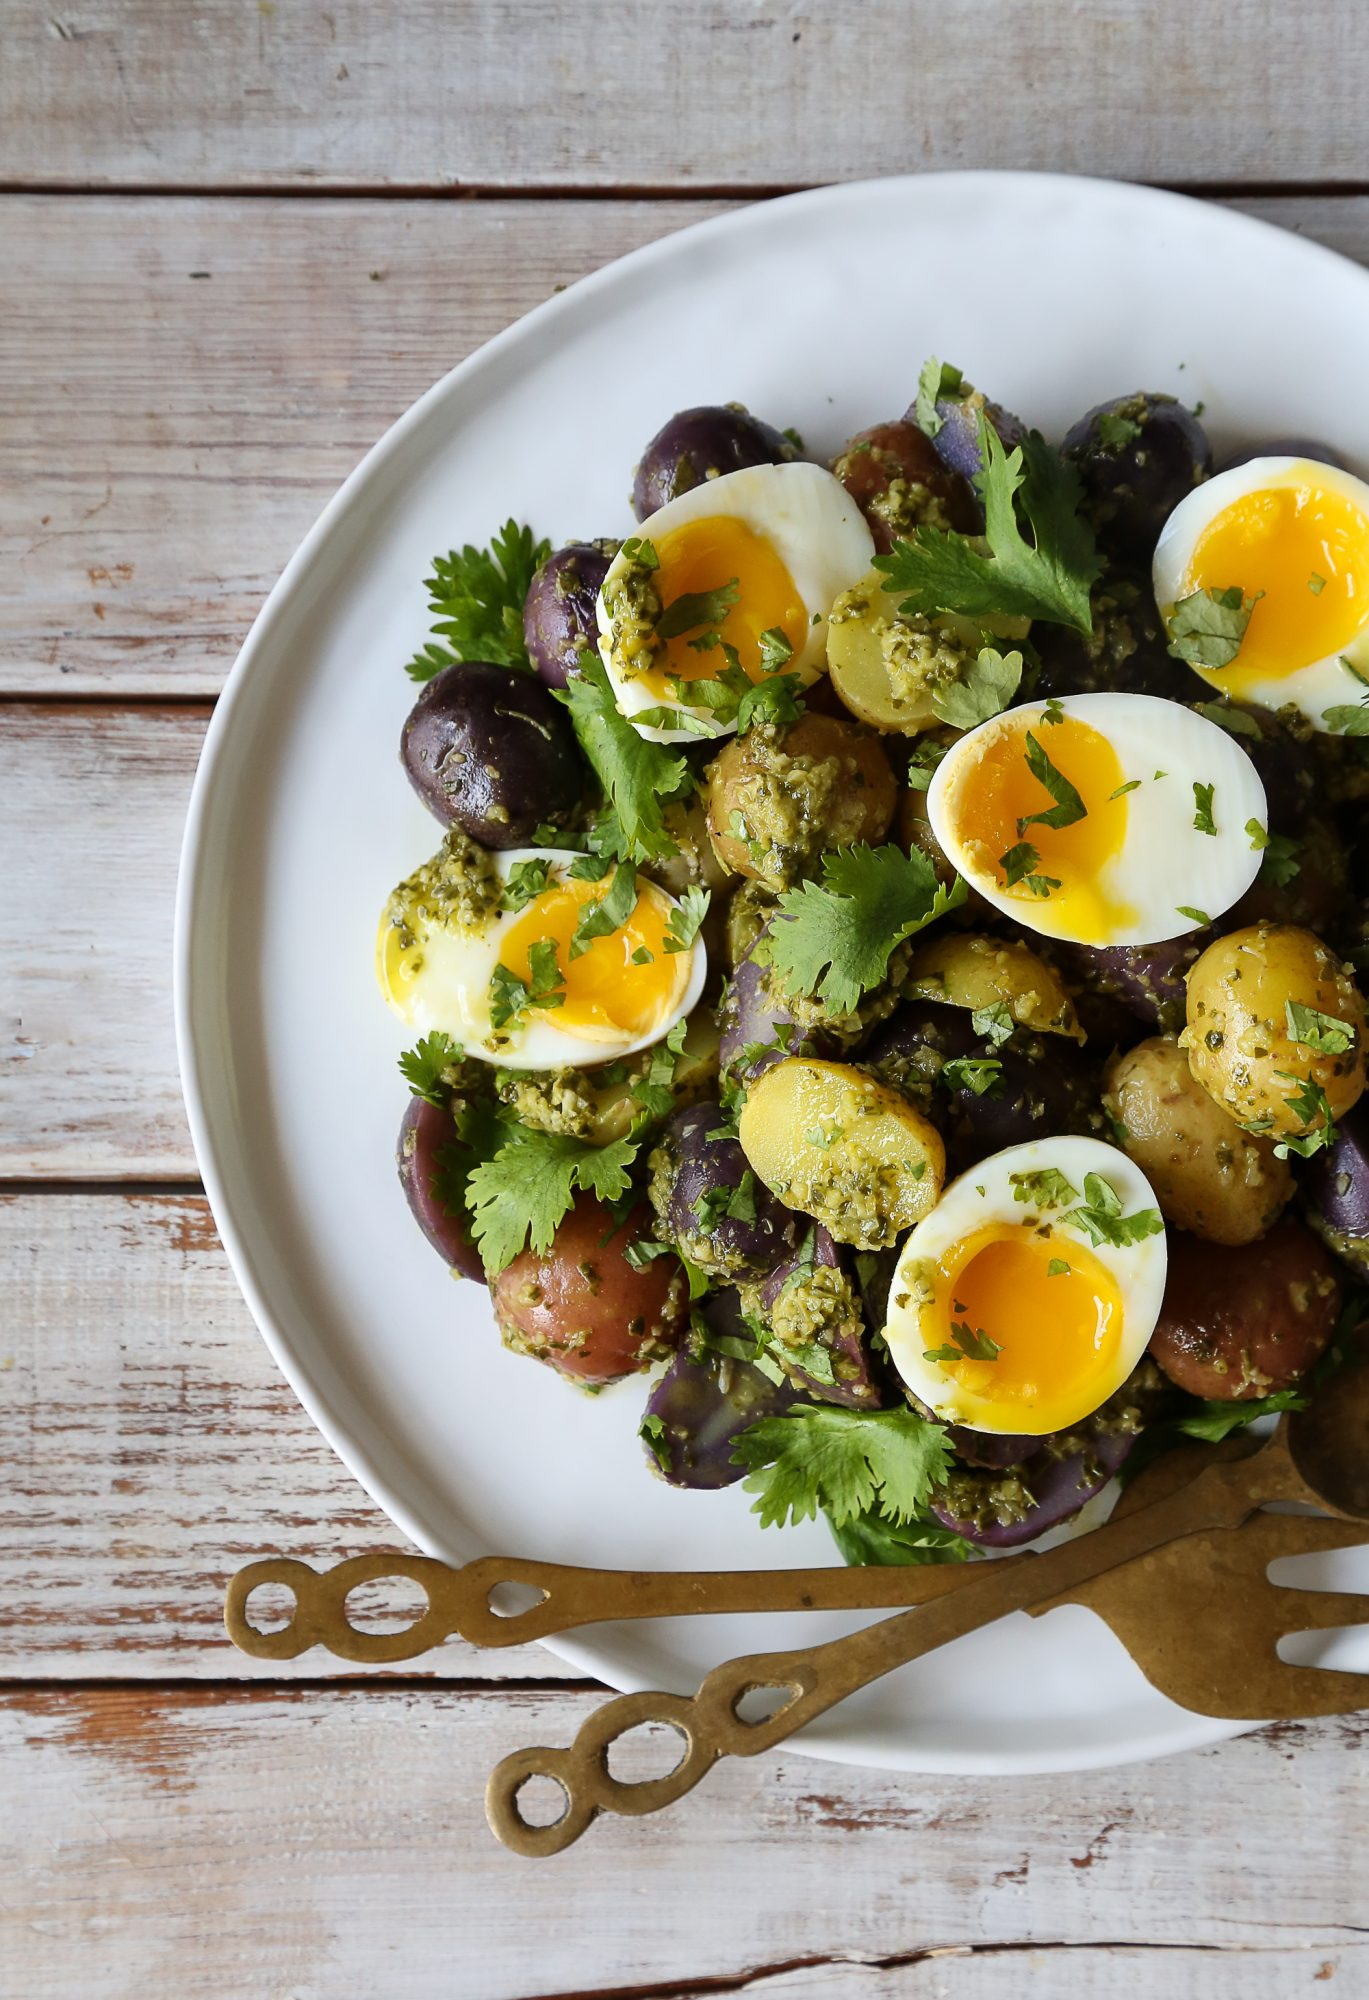 Chimichurri Potato and Egg Salad